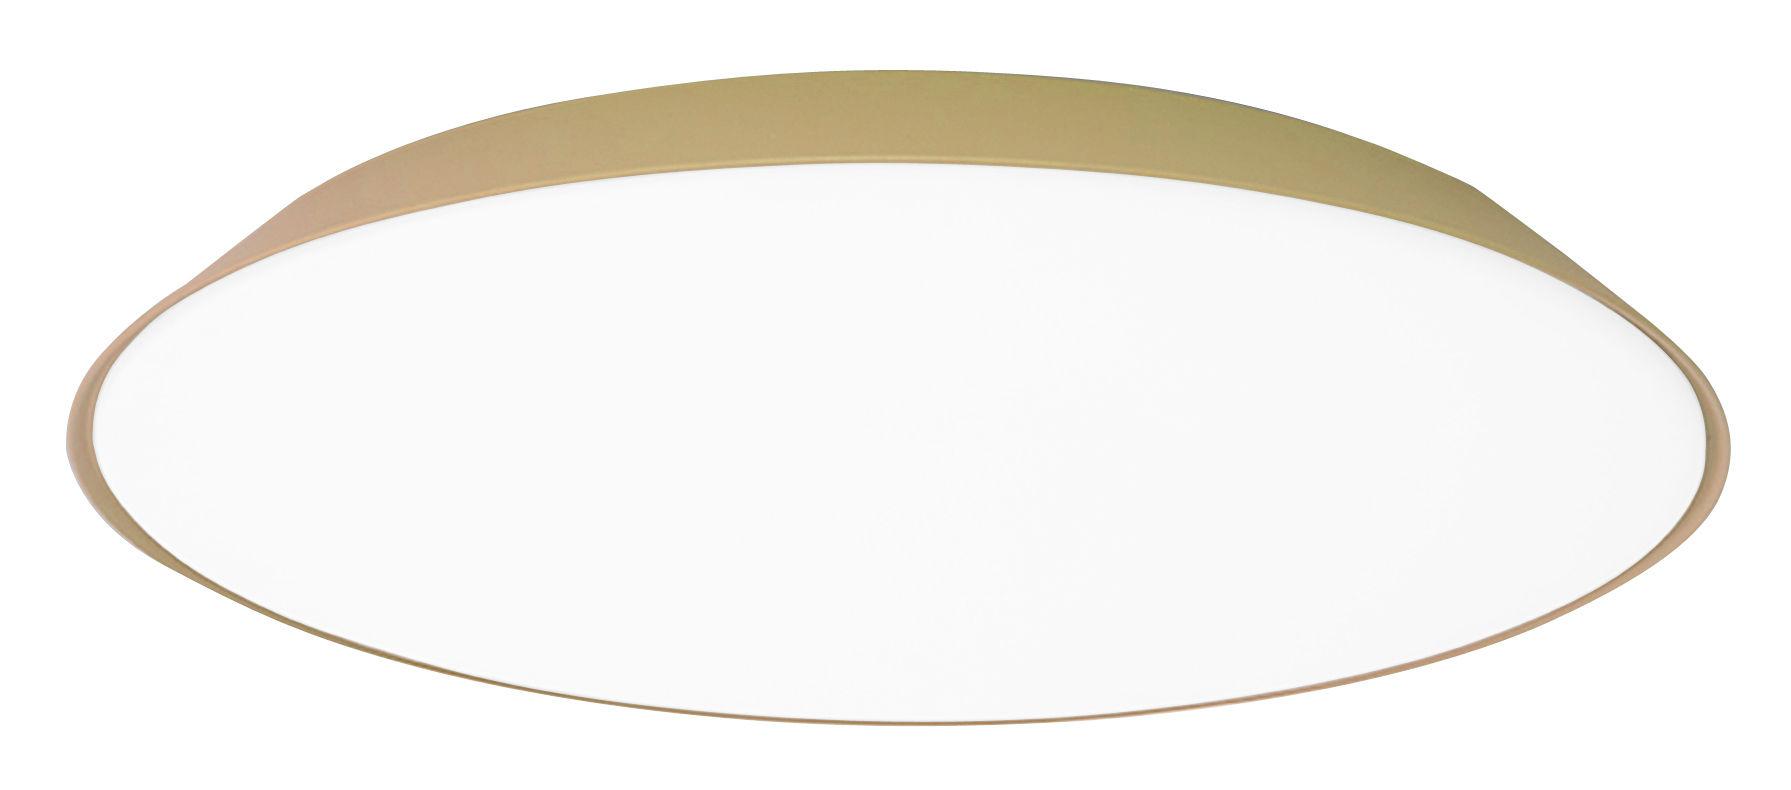 Leuchten - Wandleuchten - Febe LED Wandleuchte / Deckenleuchte - Ø 61 cm - Artemide - Taubengrau - Methacrylate, Polykarbonat